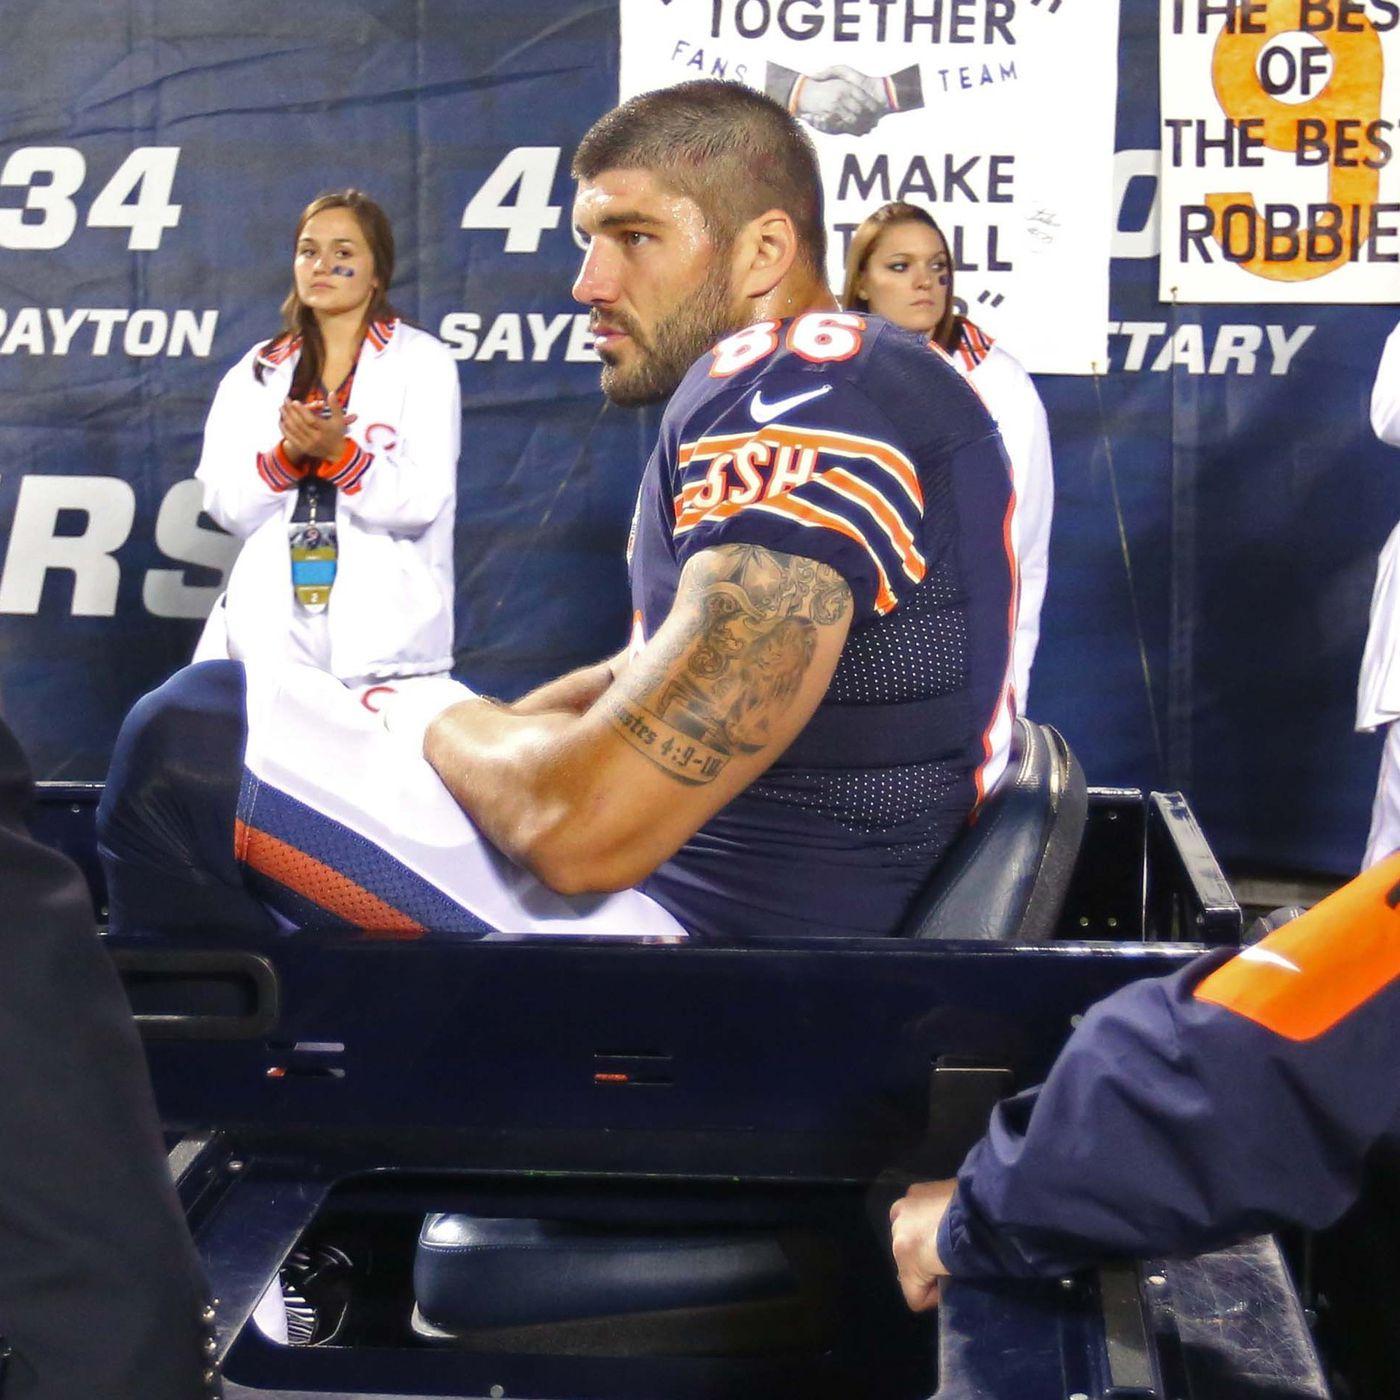 online store 860d2 eaf62 Chicago Bears place tight end Zach Miller on injured reserve ...